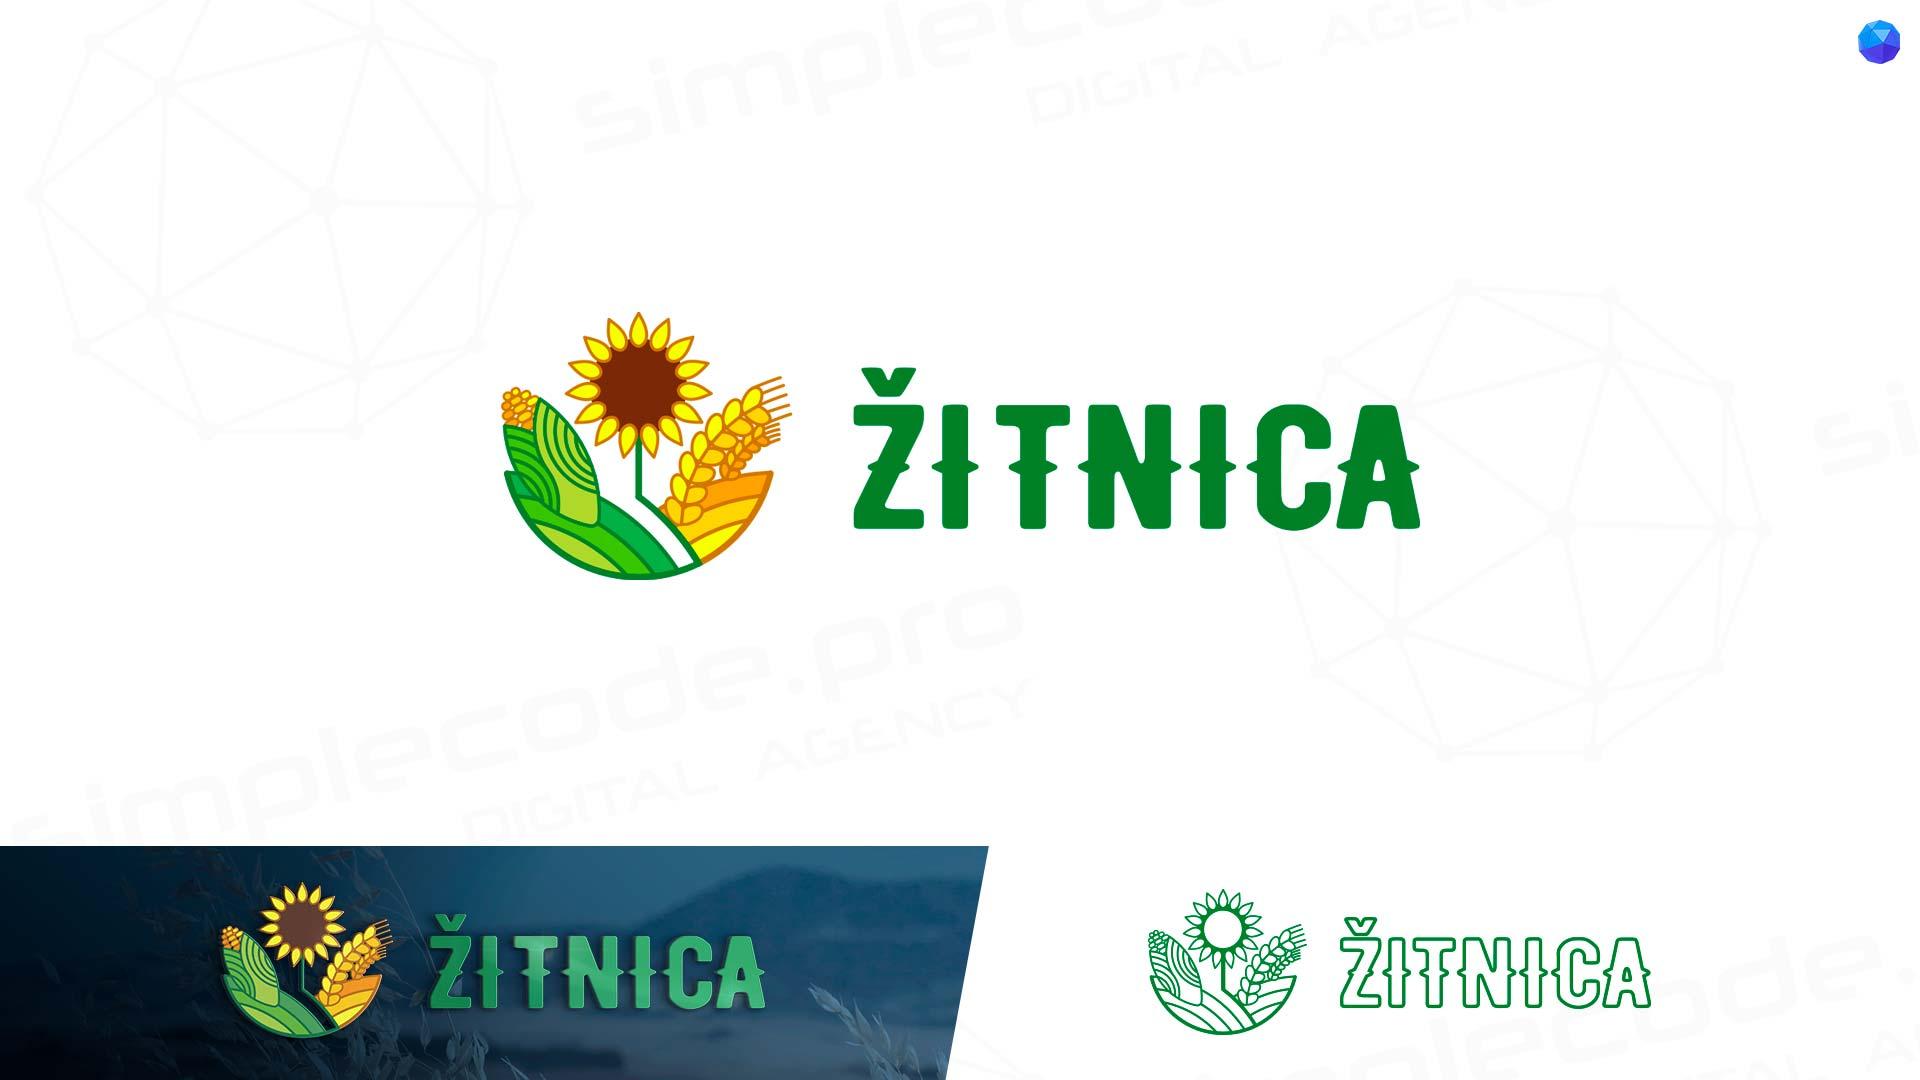 Zitnica.com